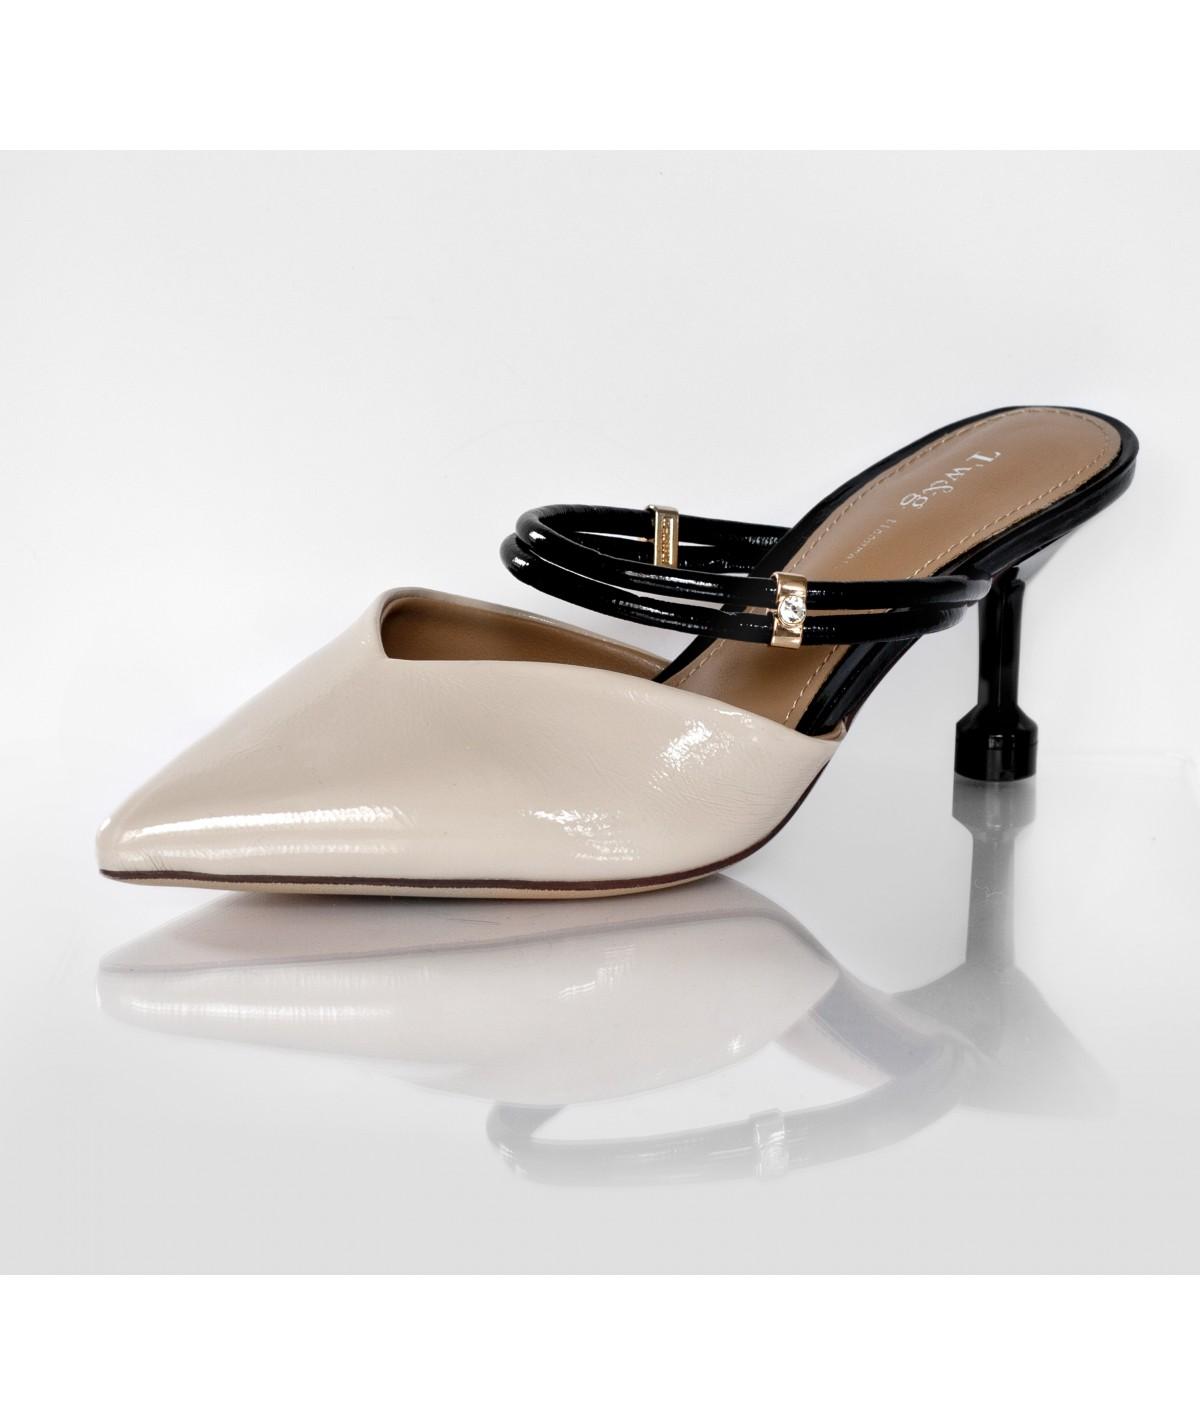 Cream Slipons with Small Heels - Rafaella